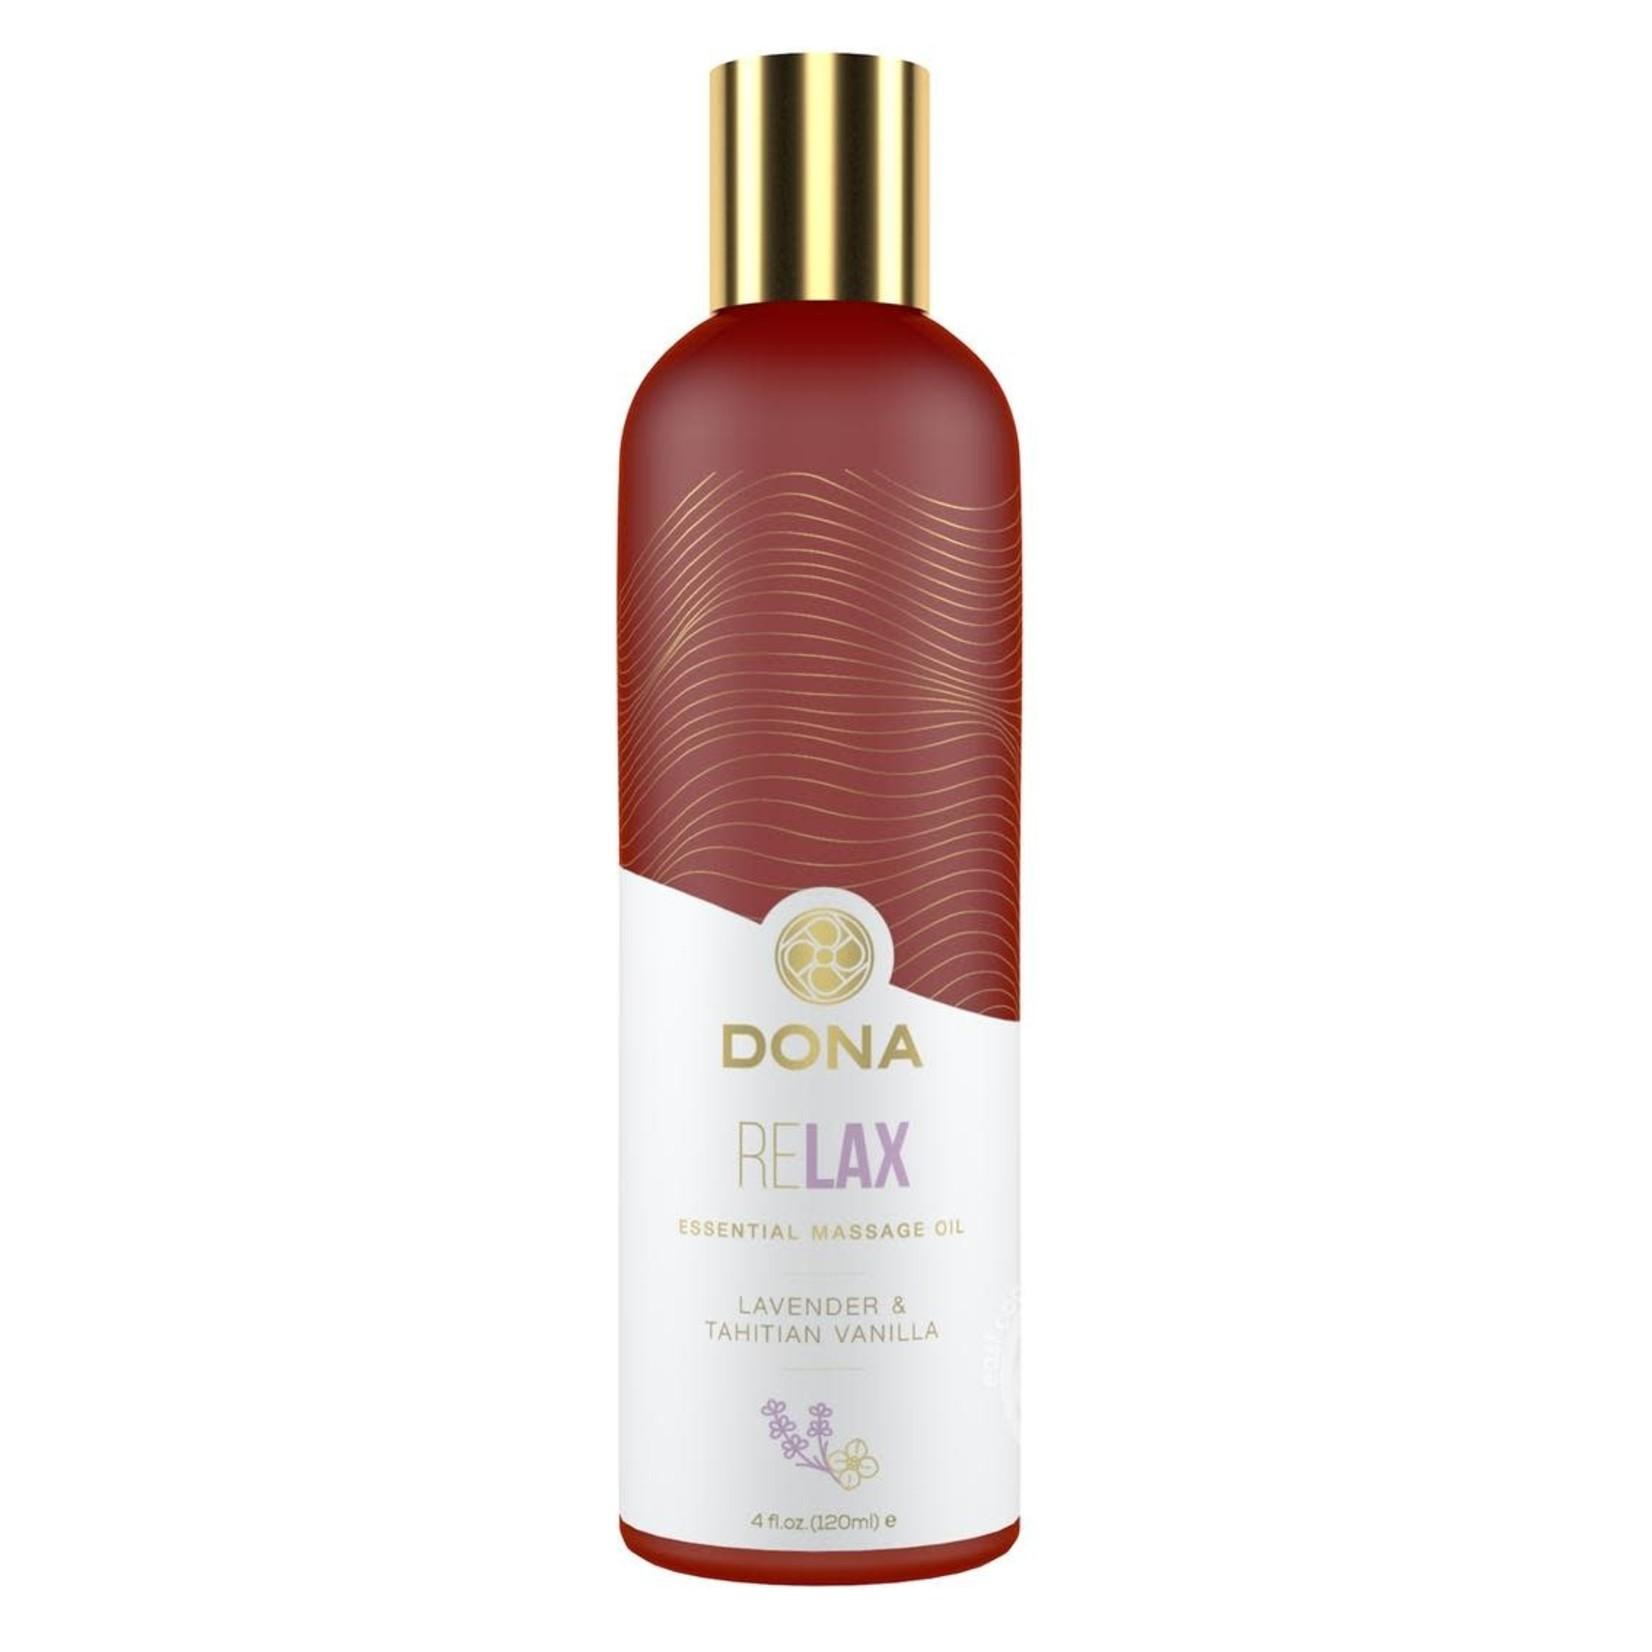 Dona Relax Vegan Massage Oil Lavender & Tahitan Vanilla 4oz